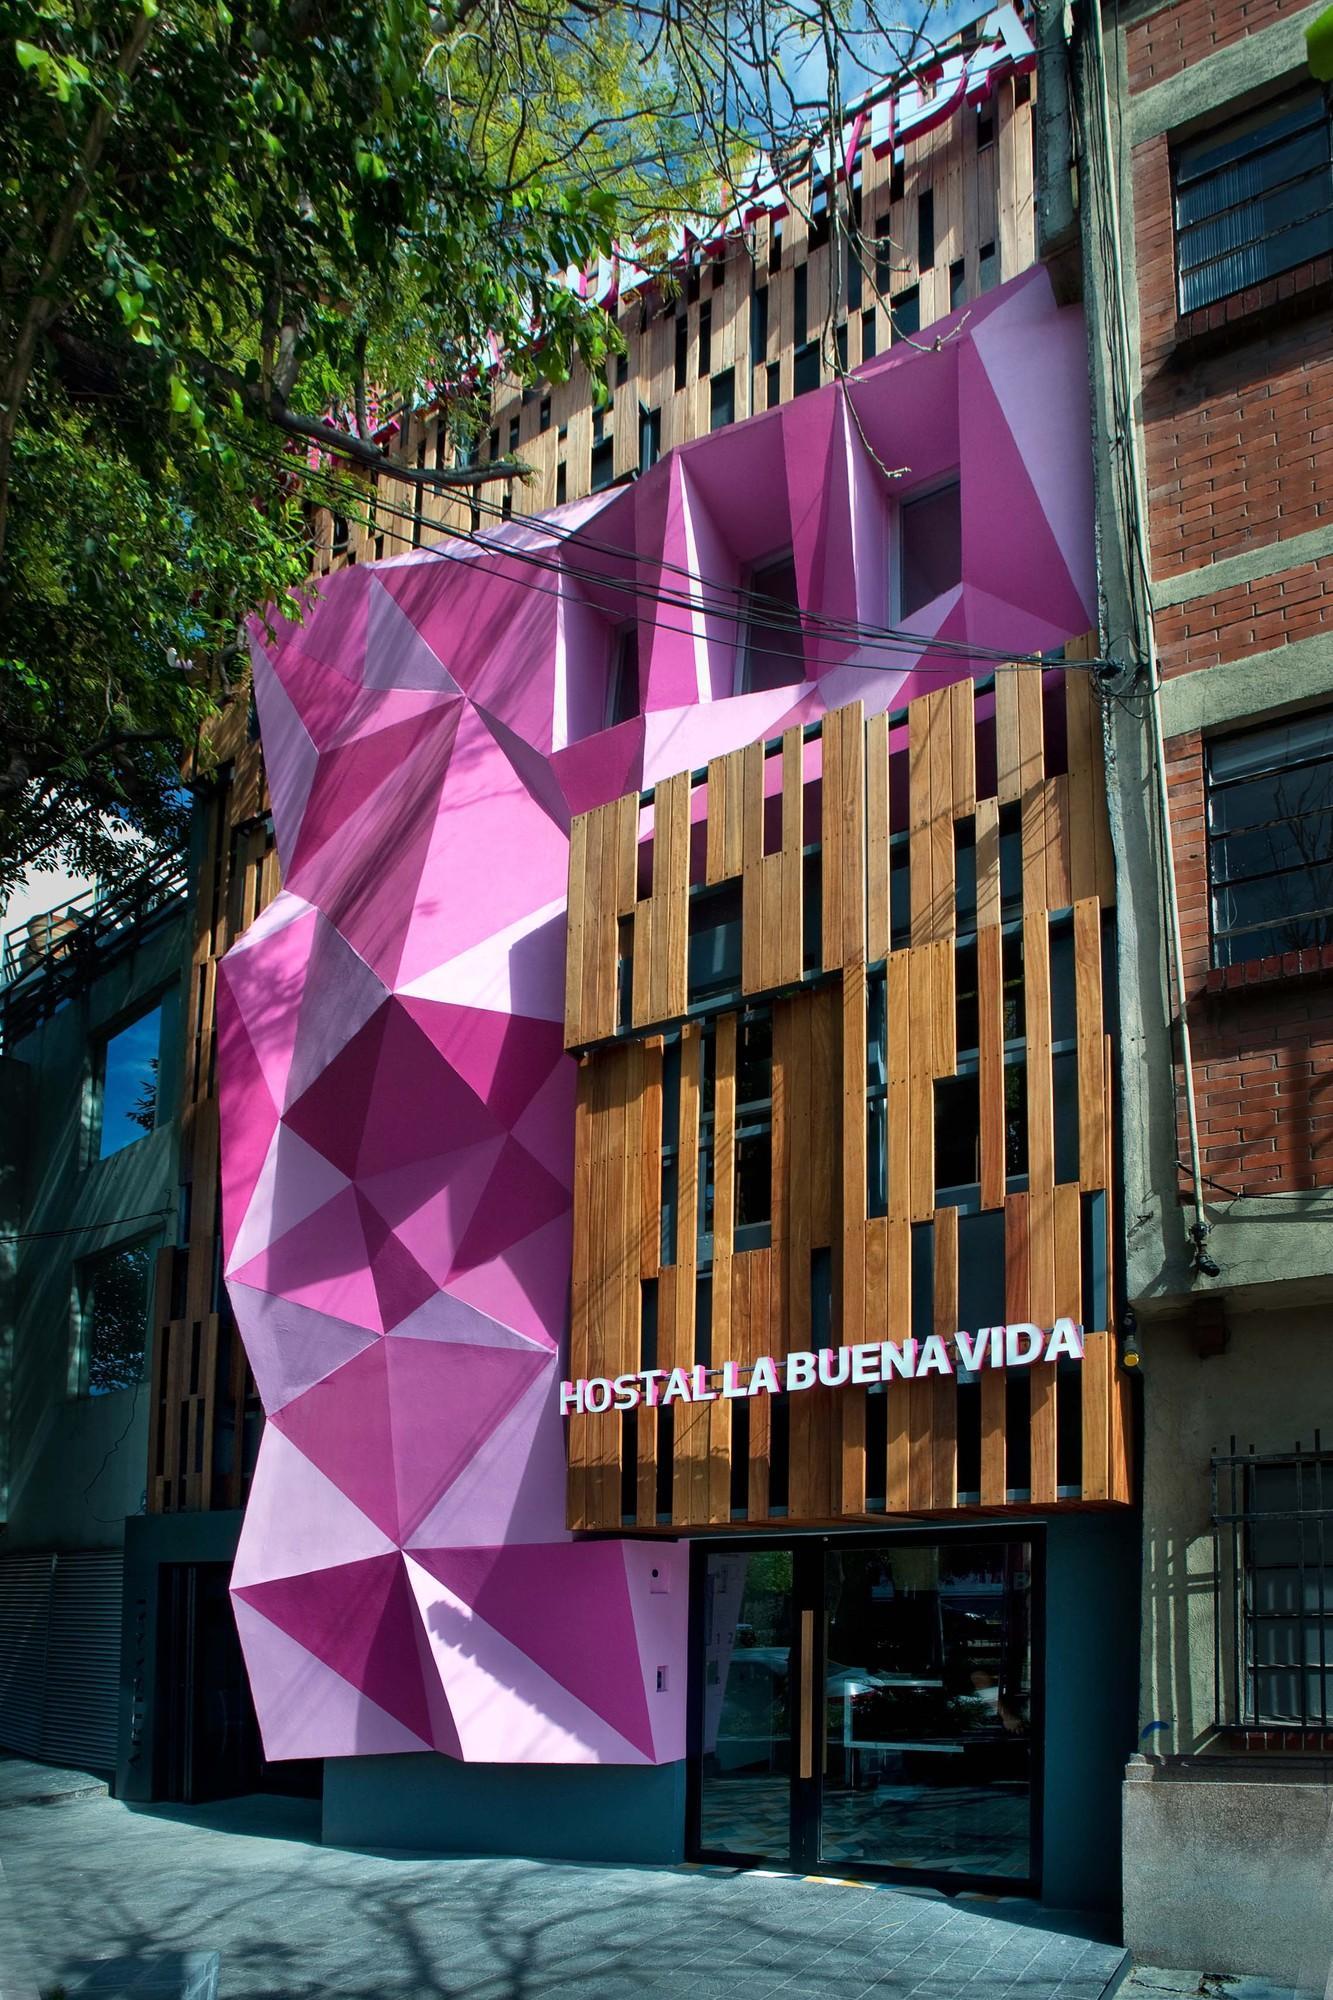 5049812928ba0d0c590001b4_hostel-la-buena-vida-arco-arquitectura-contempor-nea_hostal_la_buena_vida_-_arco_-_q_-_-_jaime_navarro.jpg (1333×2000)